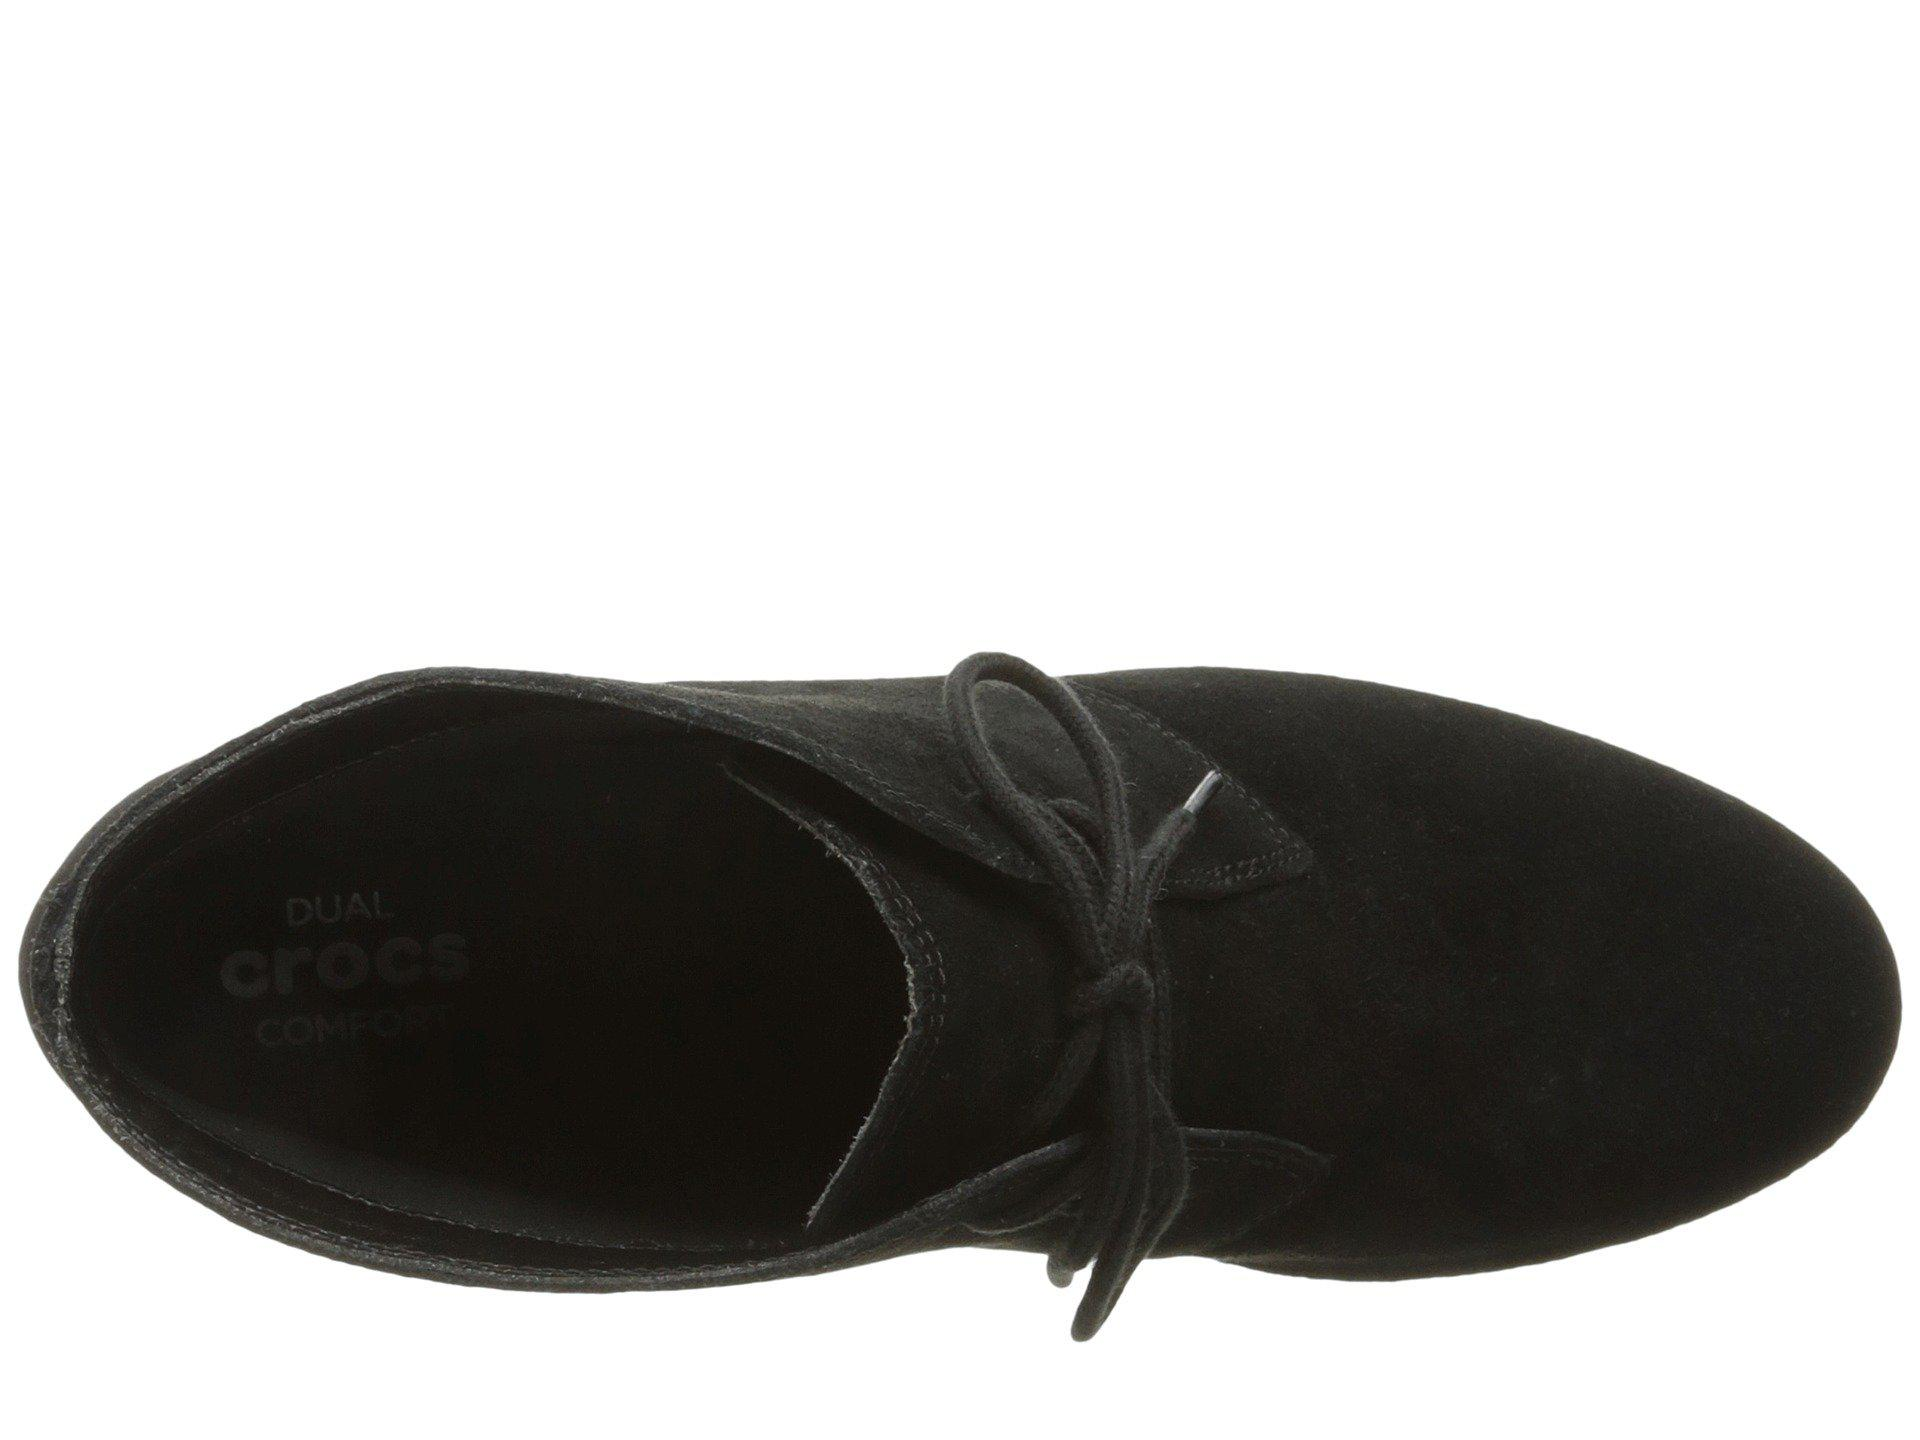 Shootie Crocs™ Black Wedge Lyst Leigh black Women's Suede In Boots gIwaUdxq